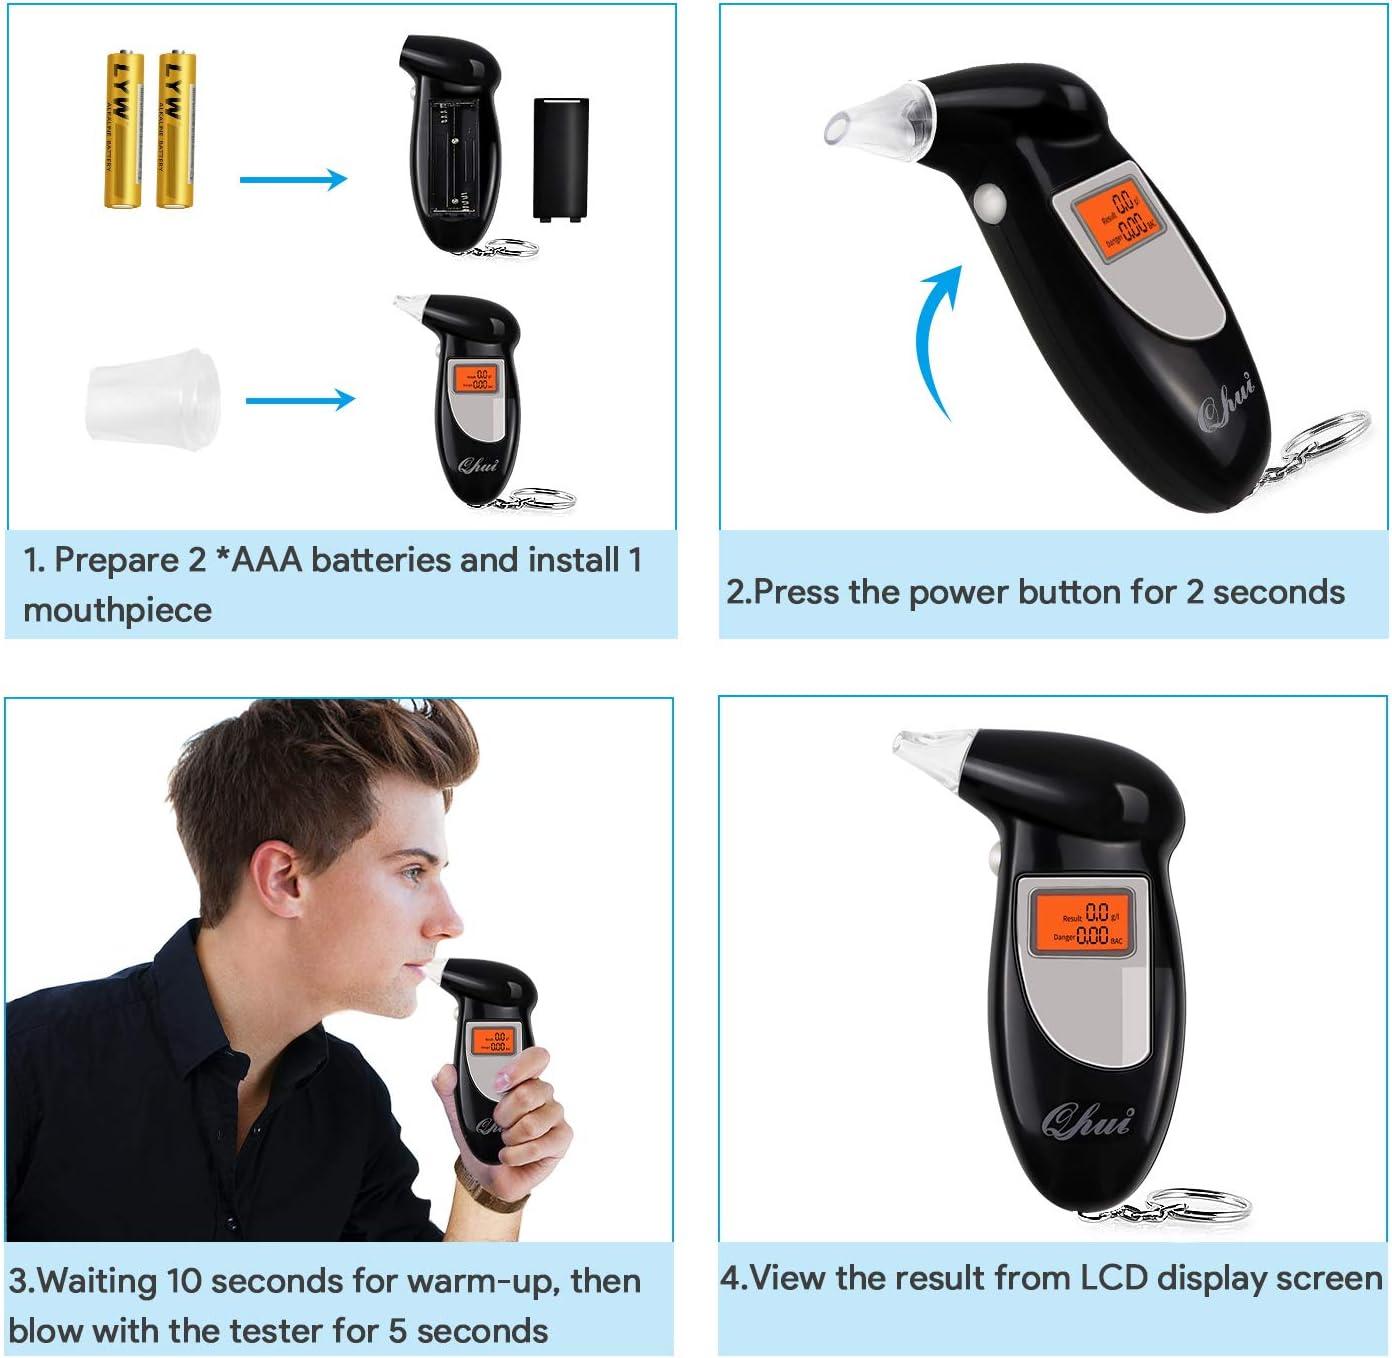 Professionale semiconduttore sensore Kit Ampio Display LCD Digitale Police etilometro Portachiavi con 5 bocchini e 2 batterie AAA Qhui Alcol Tester etilometro Portatile